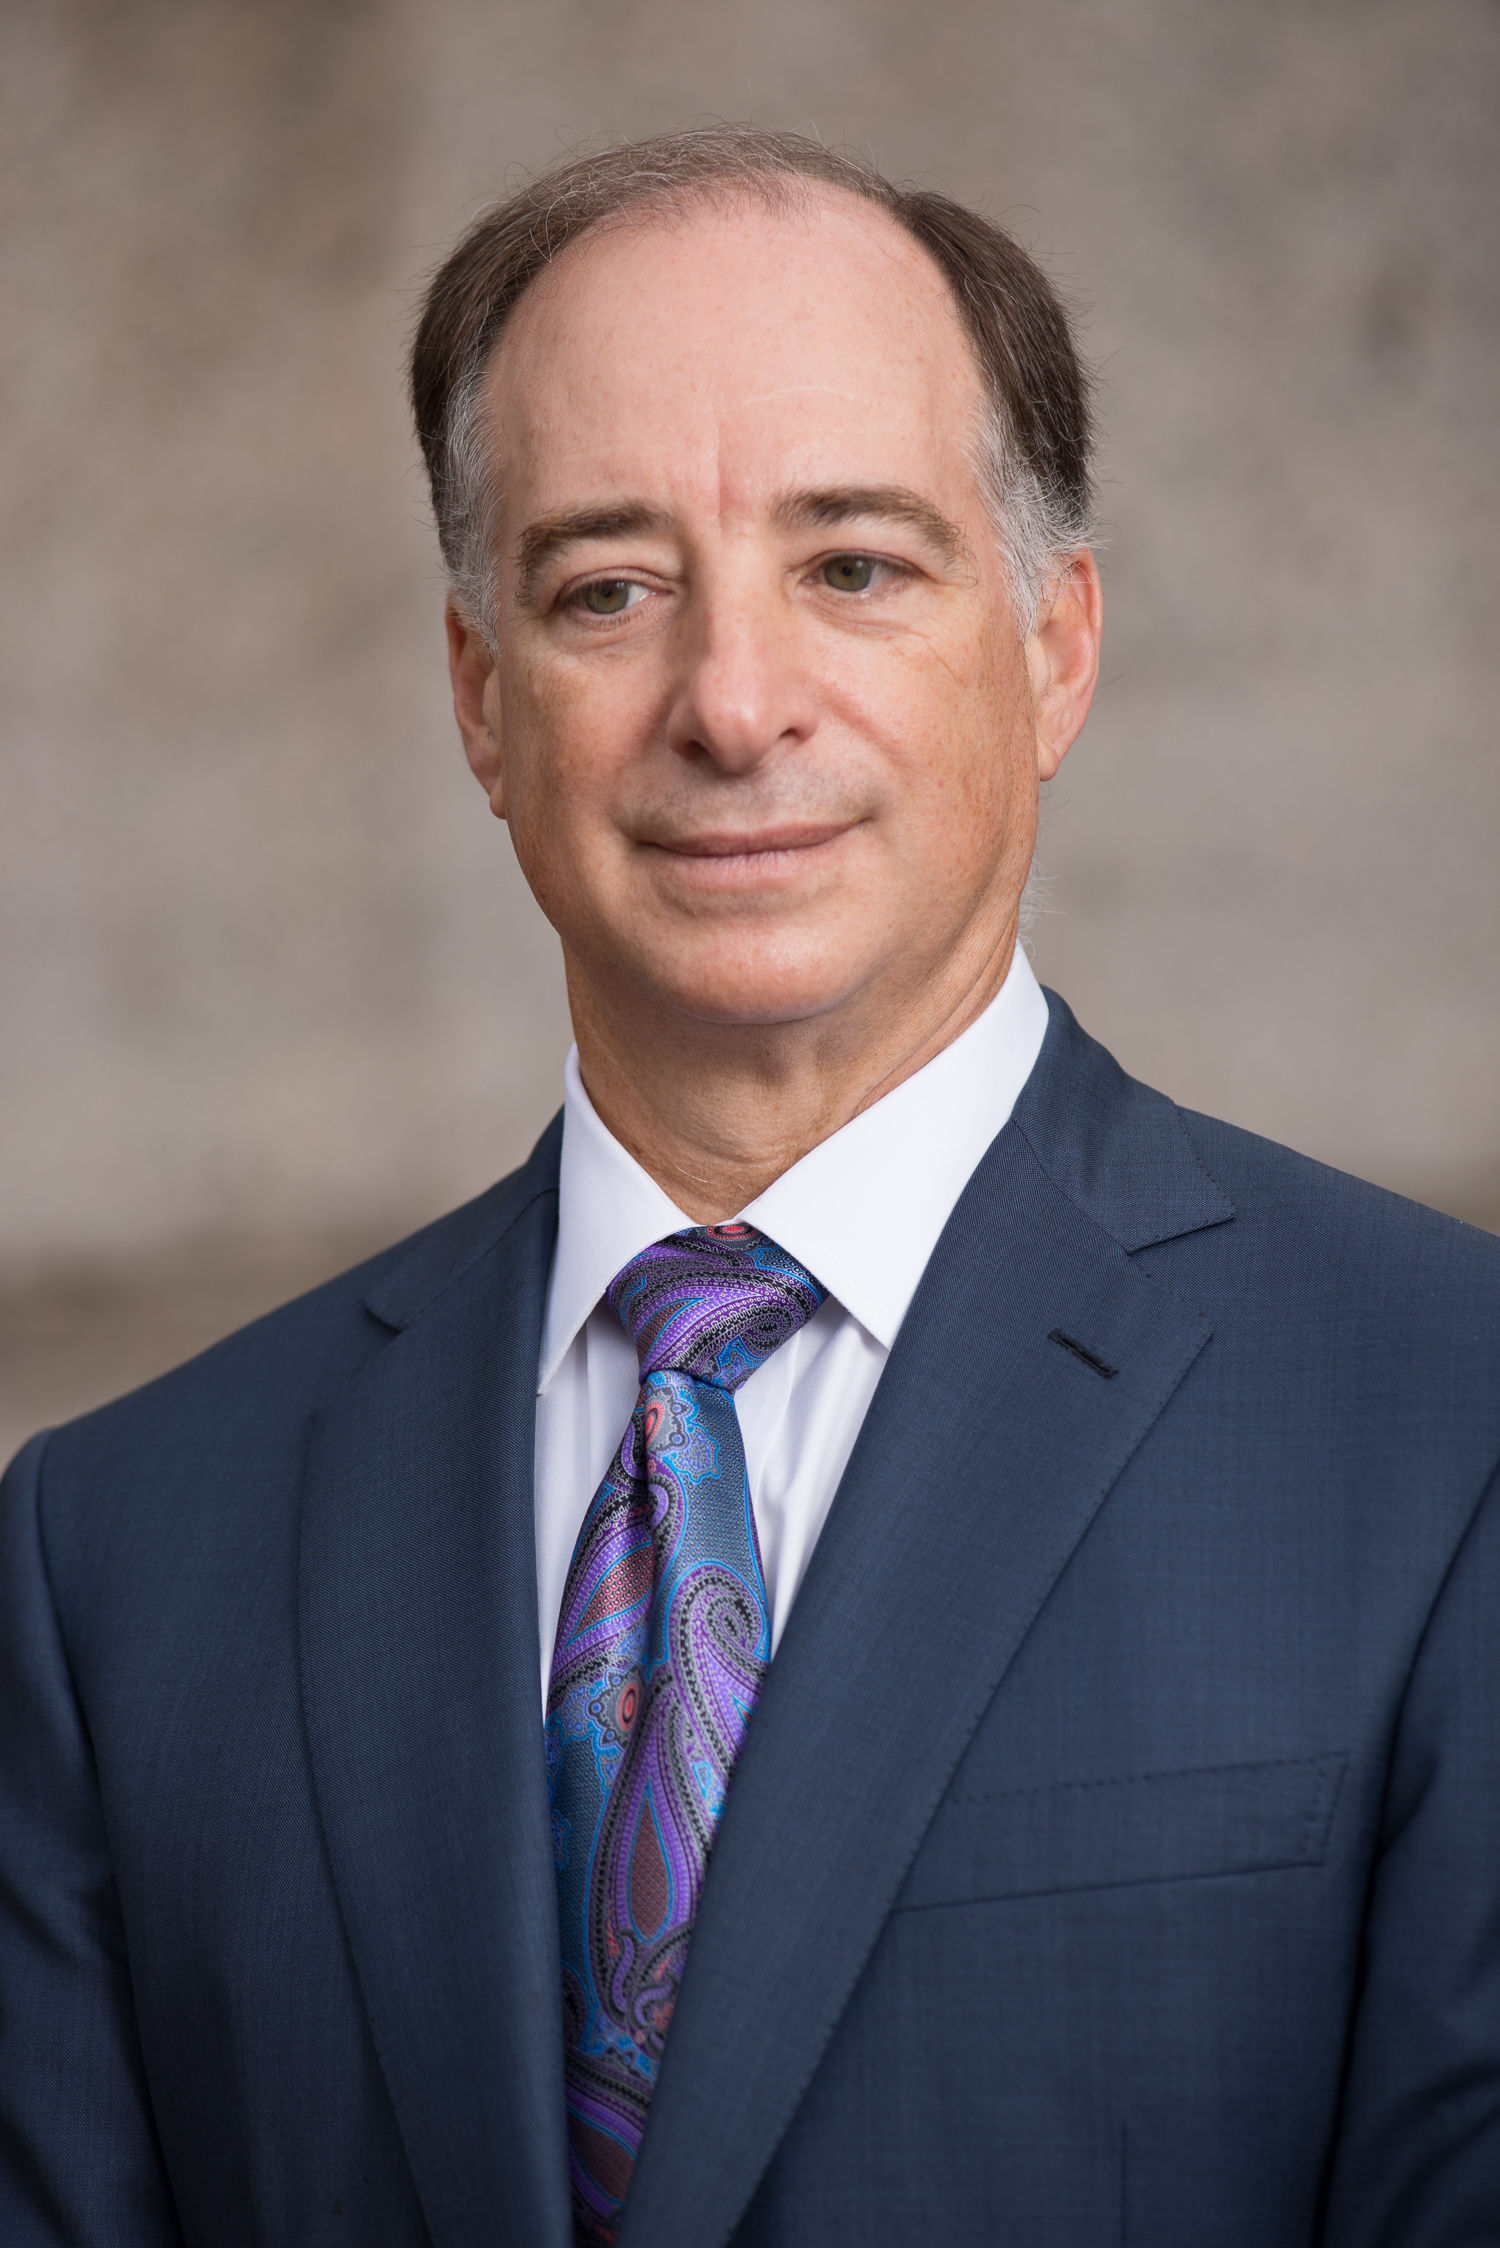 Dr. Sisti for Columbia University Medical Center